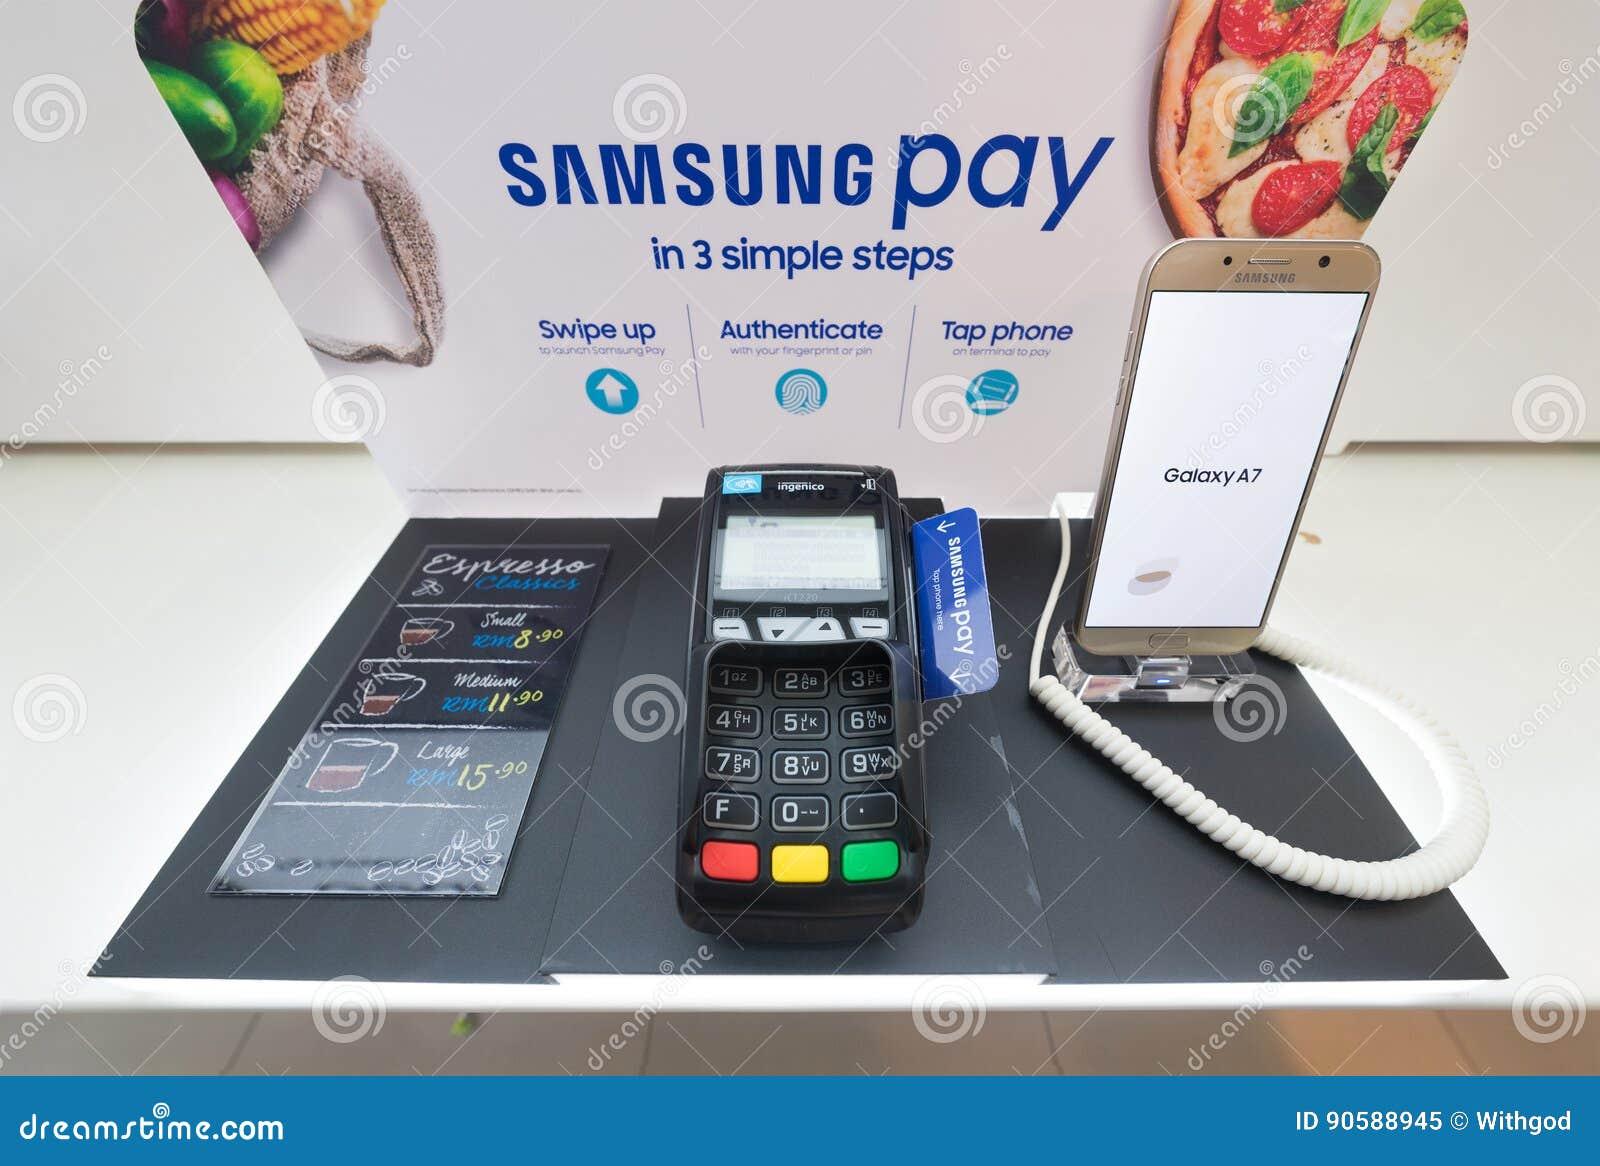 Samsung Pay In Low Yat Plaza, Kuala Lumpur Editorial Image ...